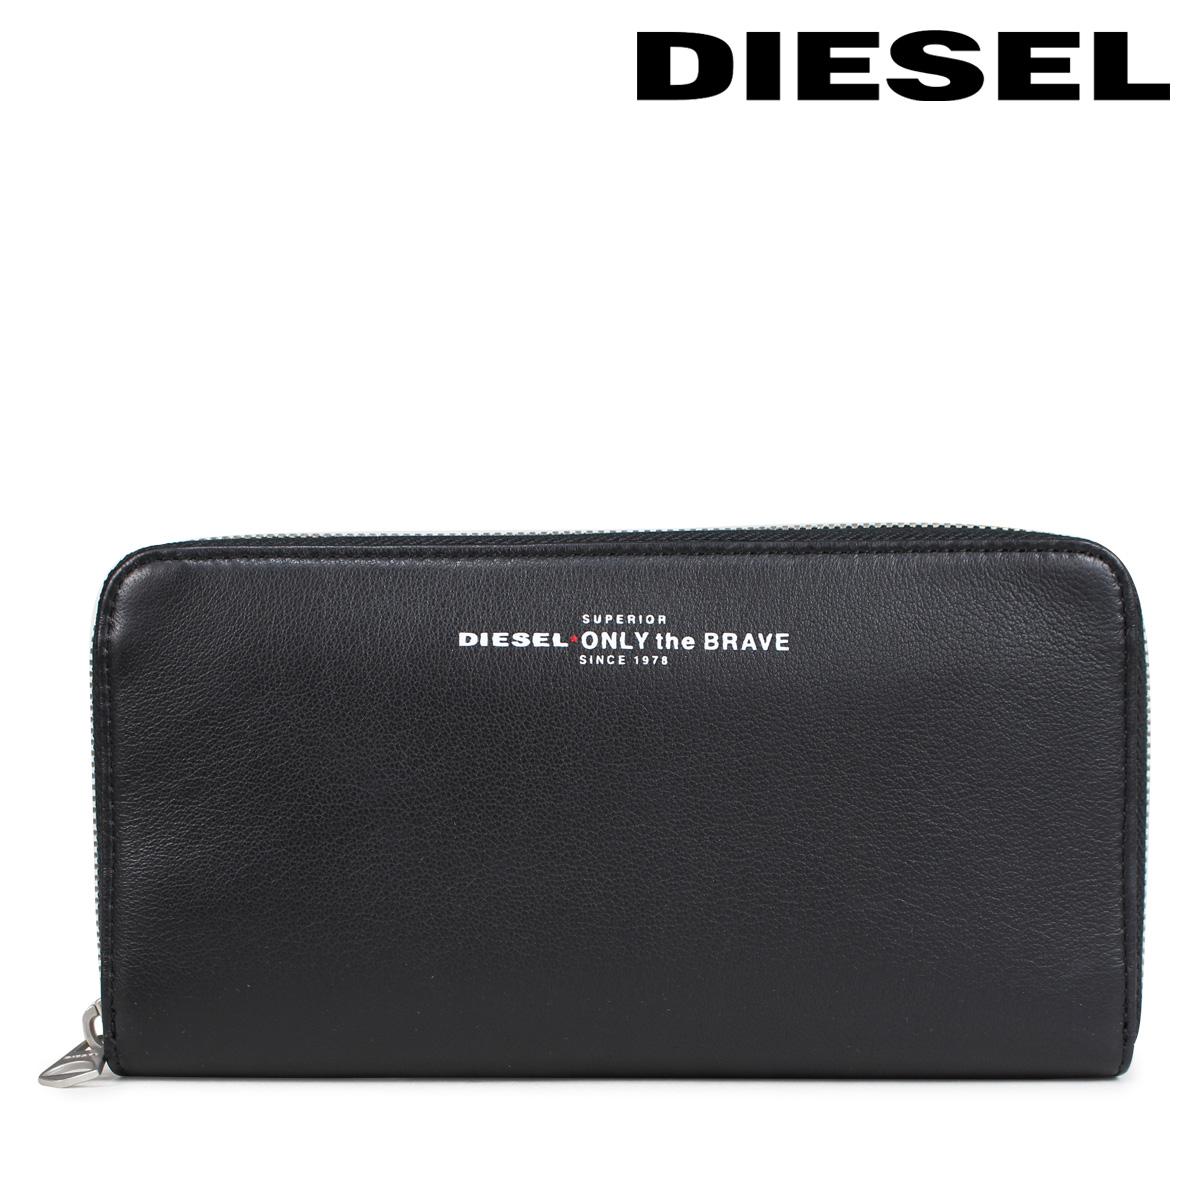 b30c8f1d73c9 DIESEL wallet diesel men long wallet round fastener READY TO STAR 24 ZIP  X05591 PR400 H2691 black  10 12 Shinnyu load